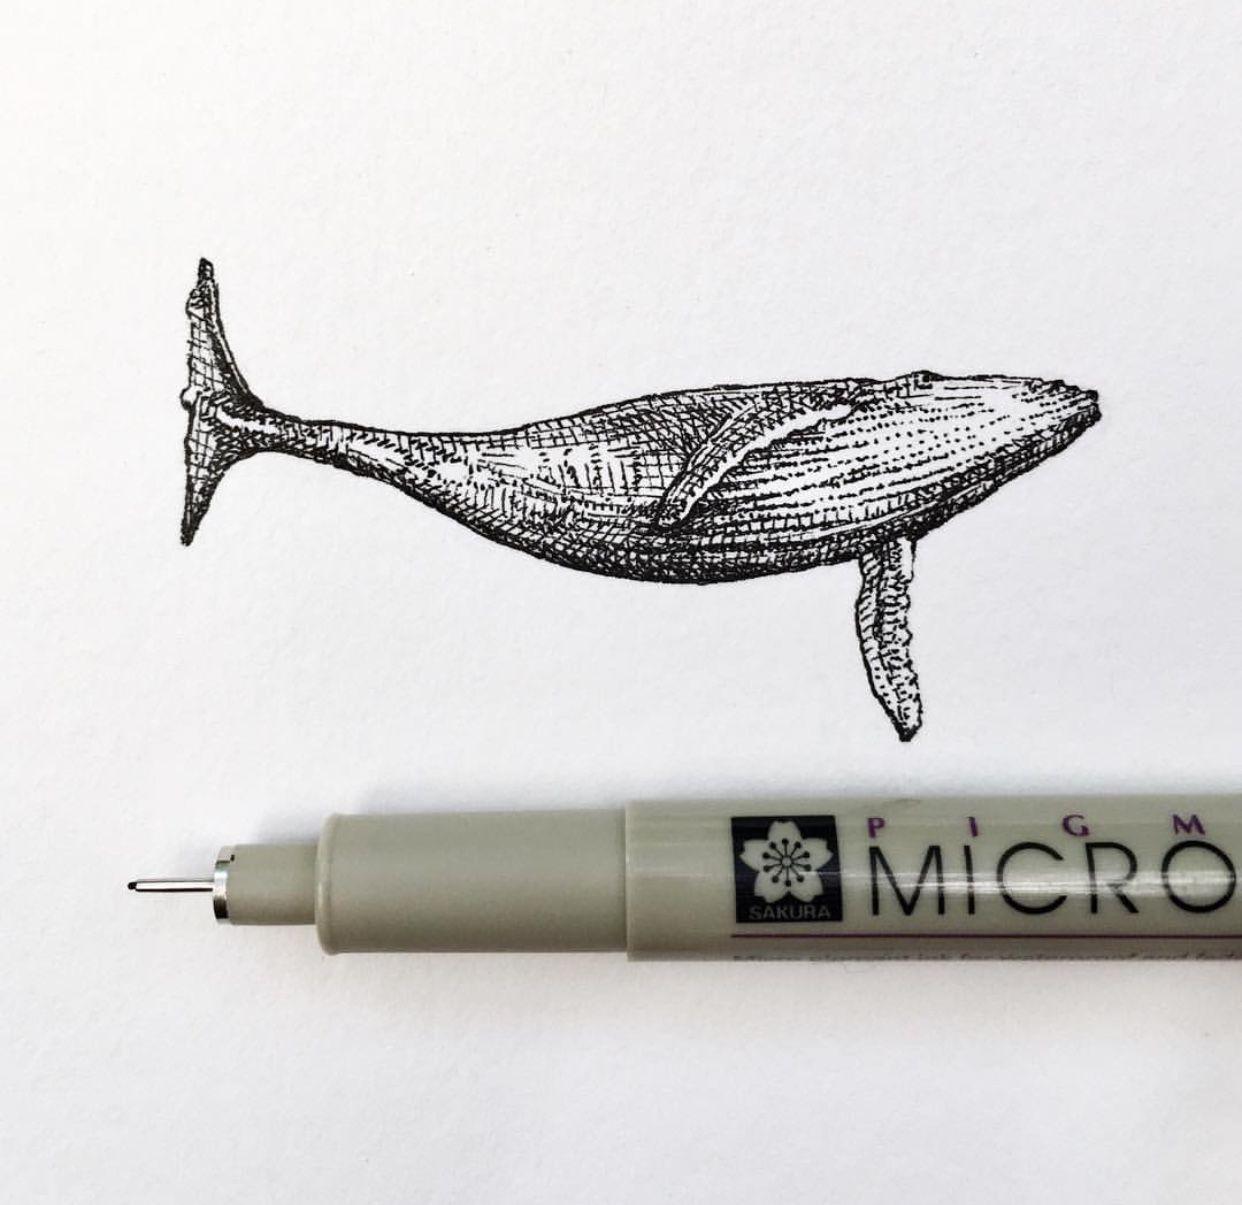 Idea by jarel taimanao on draw ink pen art ink art ink